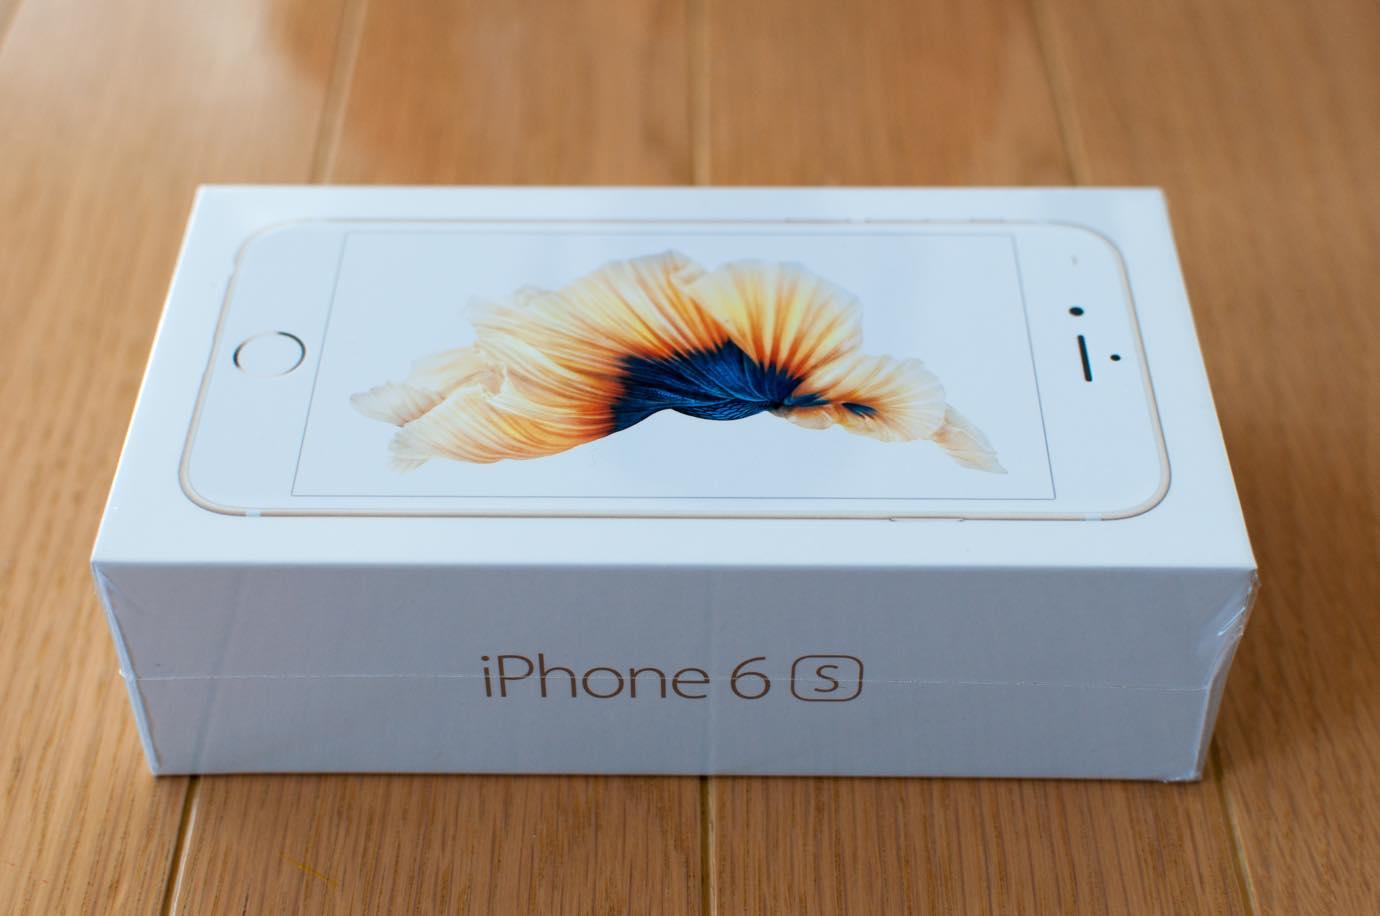 IPhone6s 07 20151005 232049